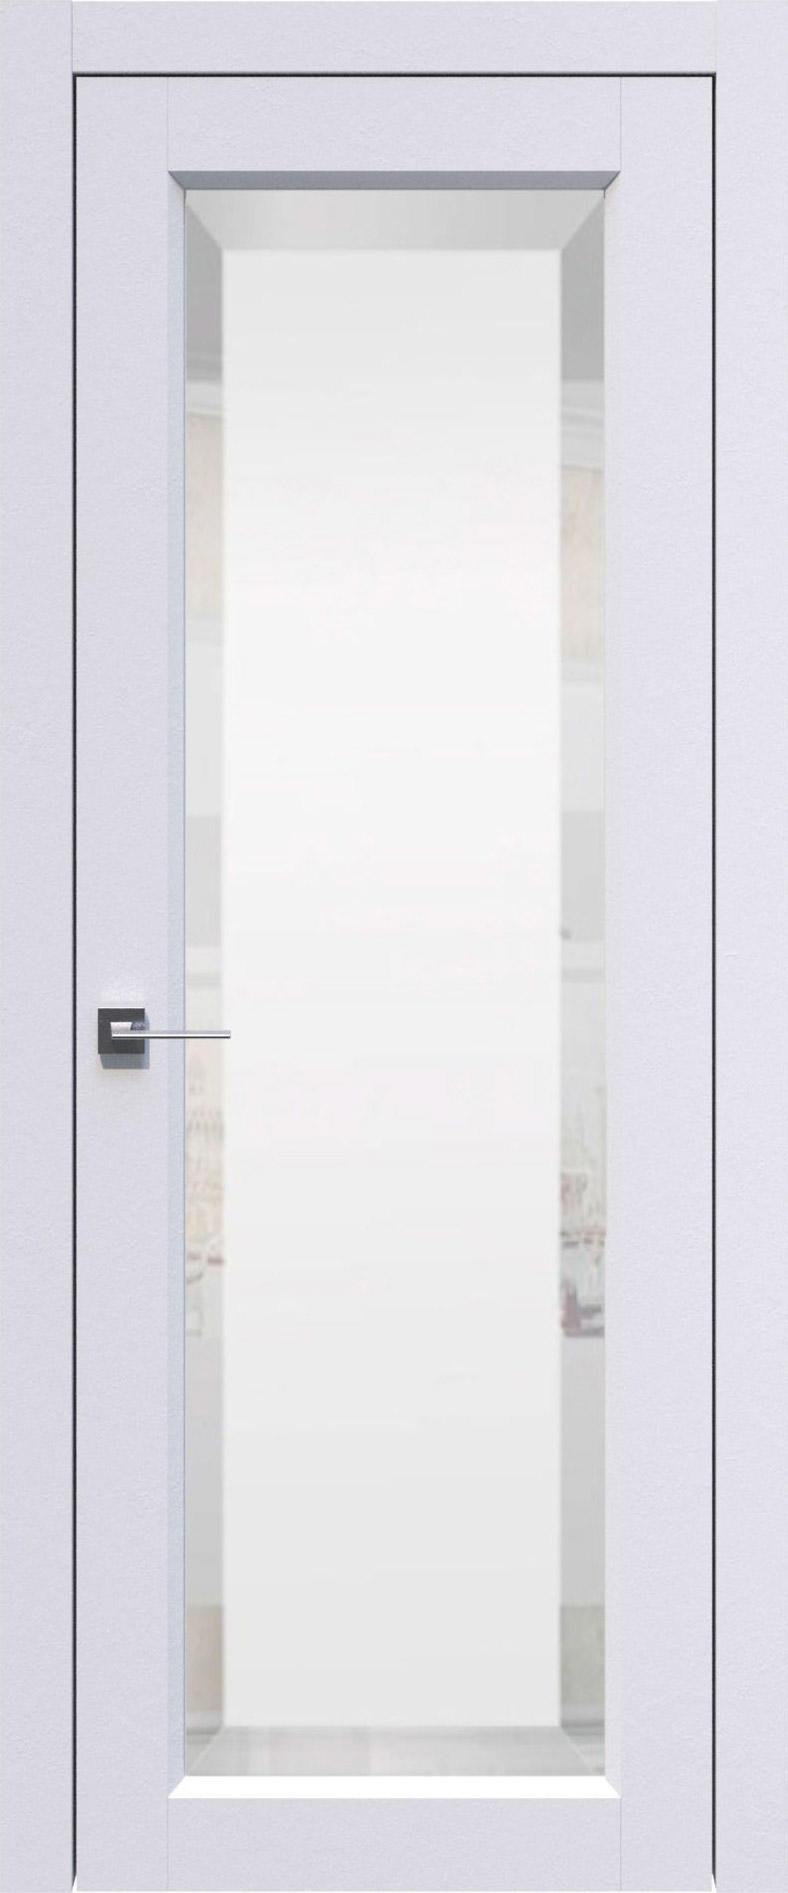 Domenica цвет - Арктик белый Со стеклом (ДО)